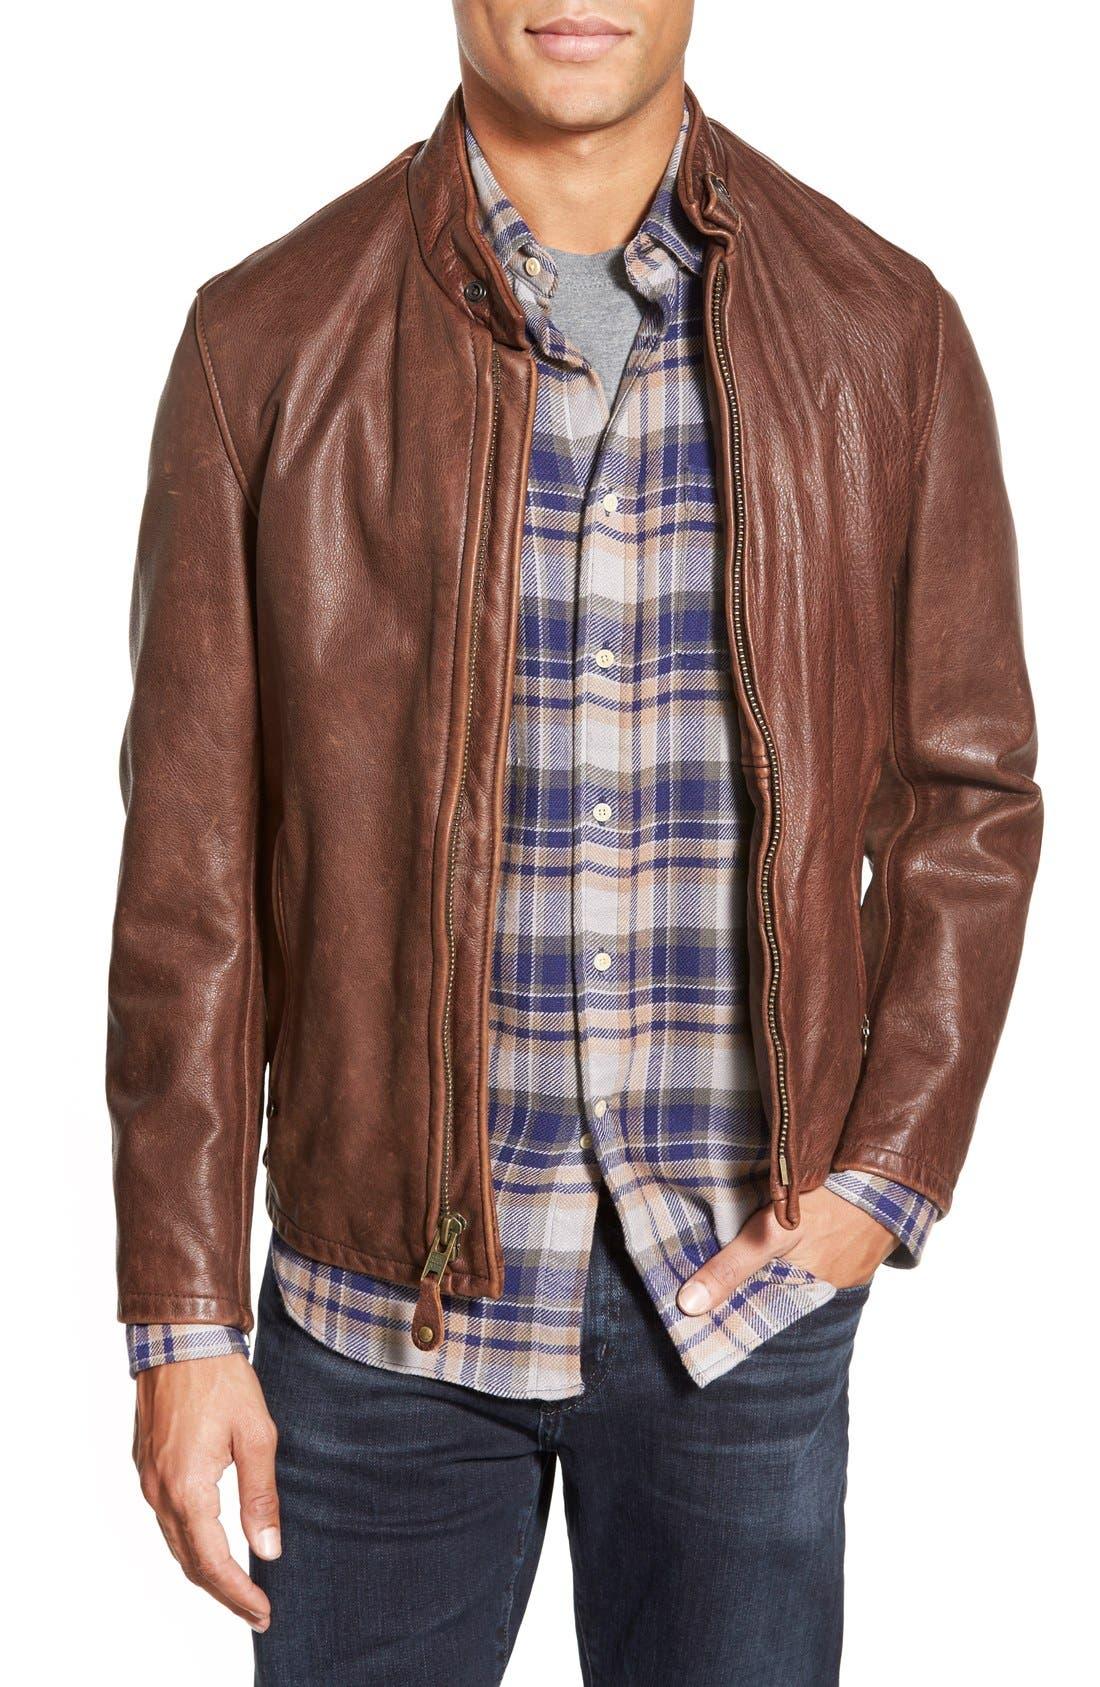 Alternate Image 1 Selected - Schott NYC Café Racer Slim Fit Leather Jacket